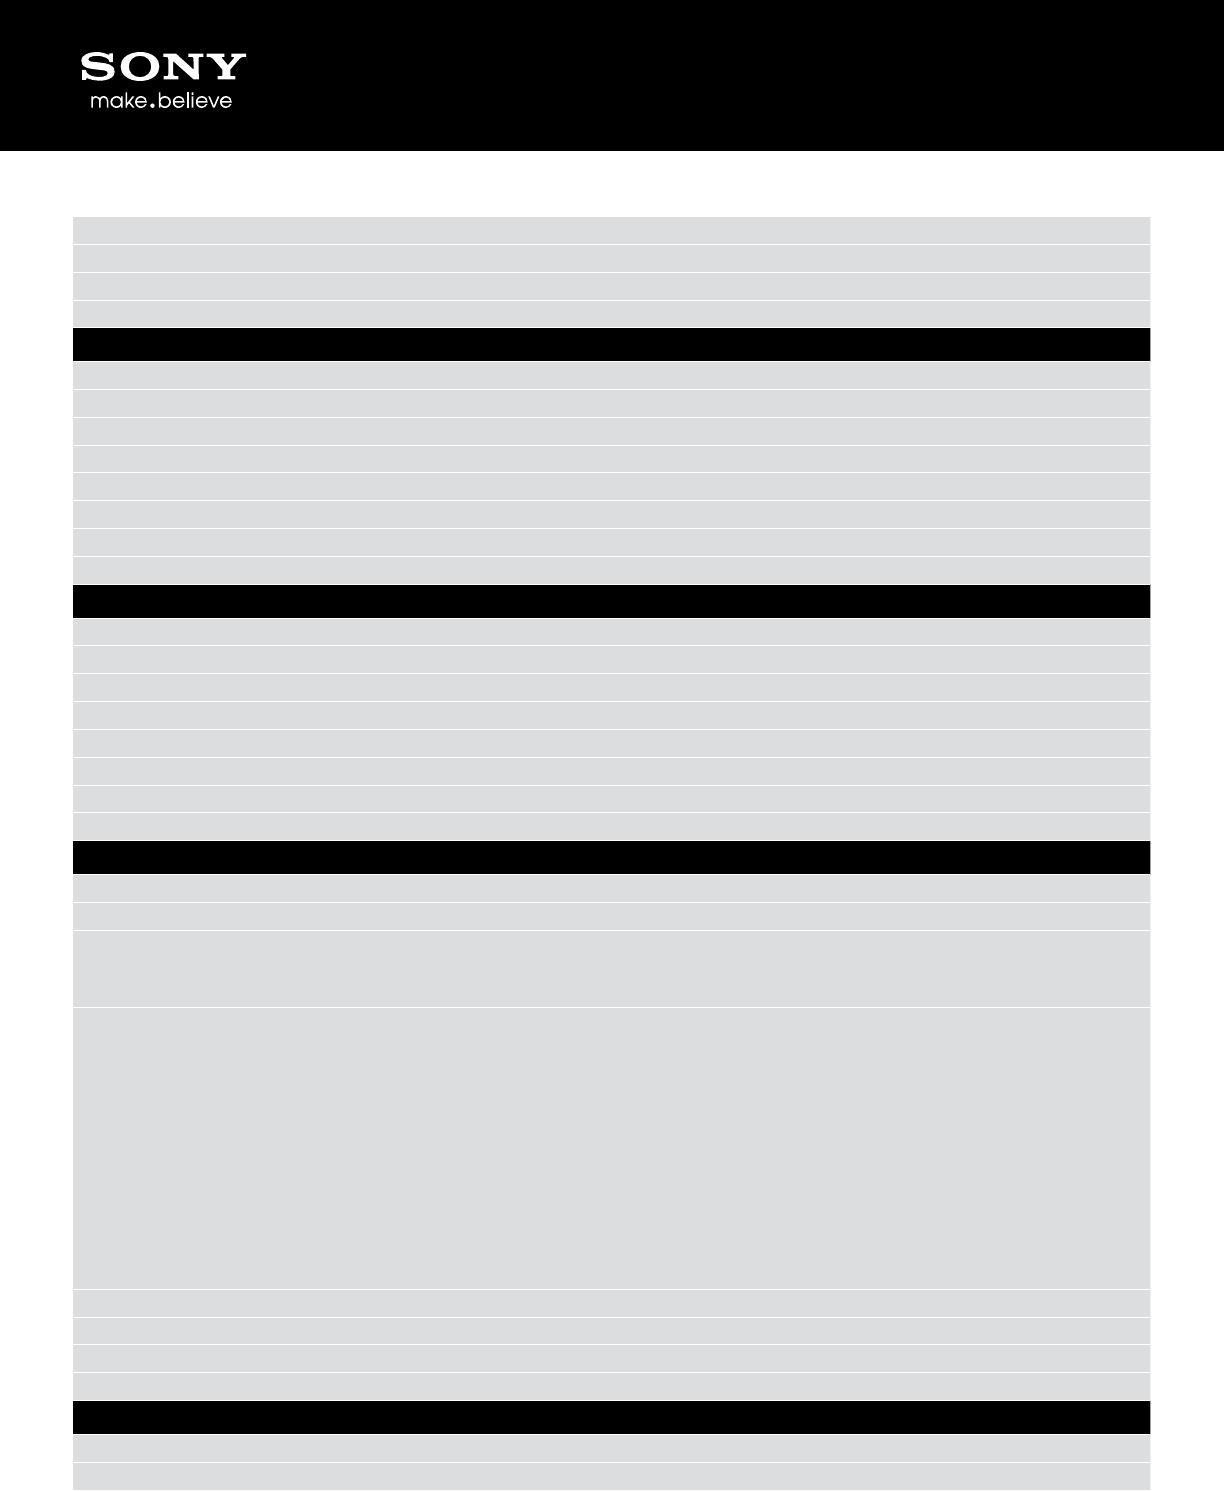 sony mex bt4000p marketing specifications Sony Radio Wiring Diagram